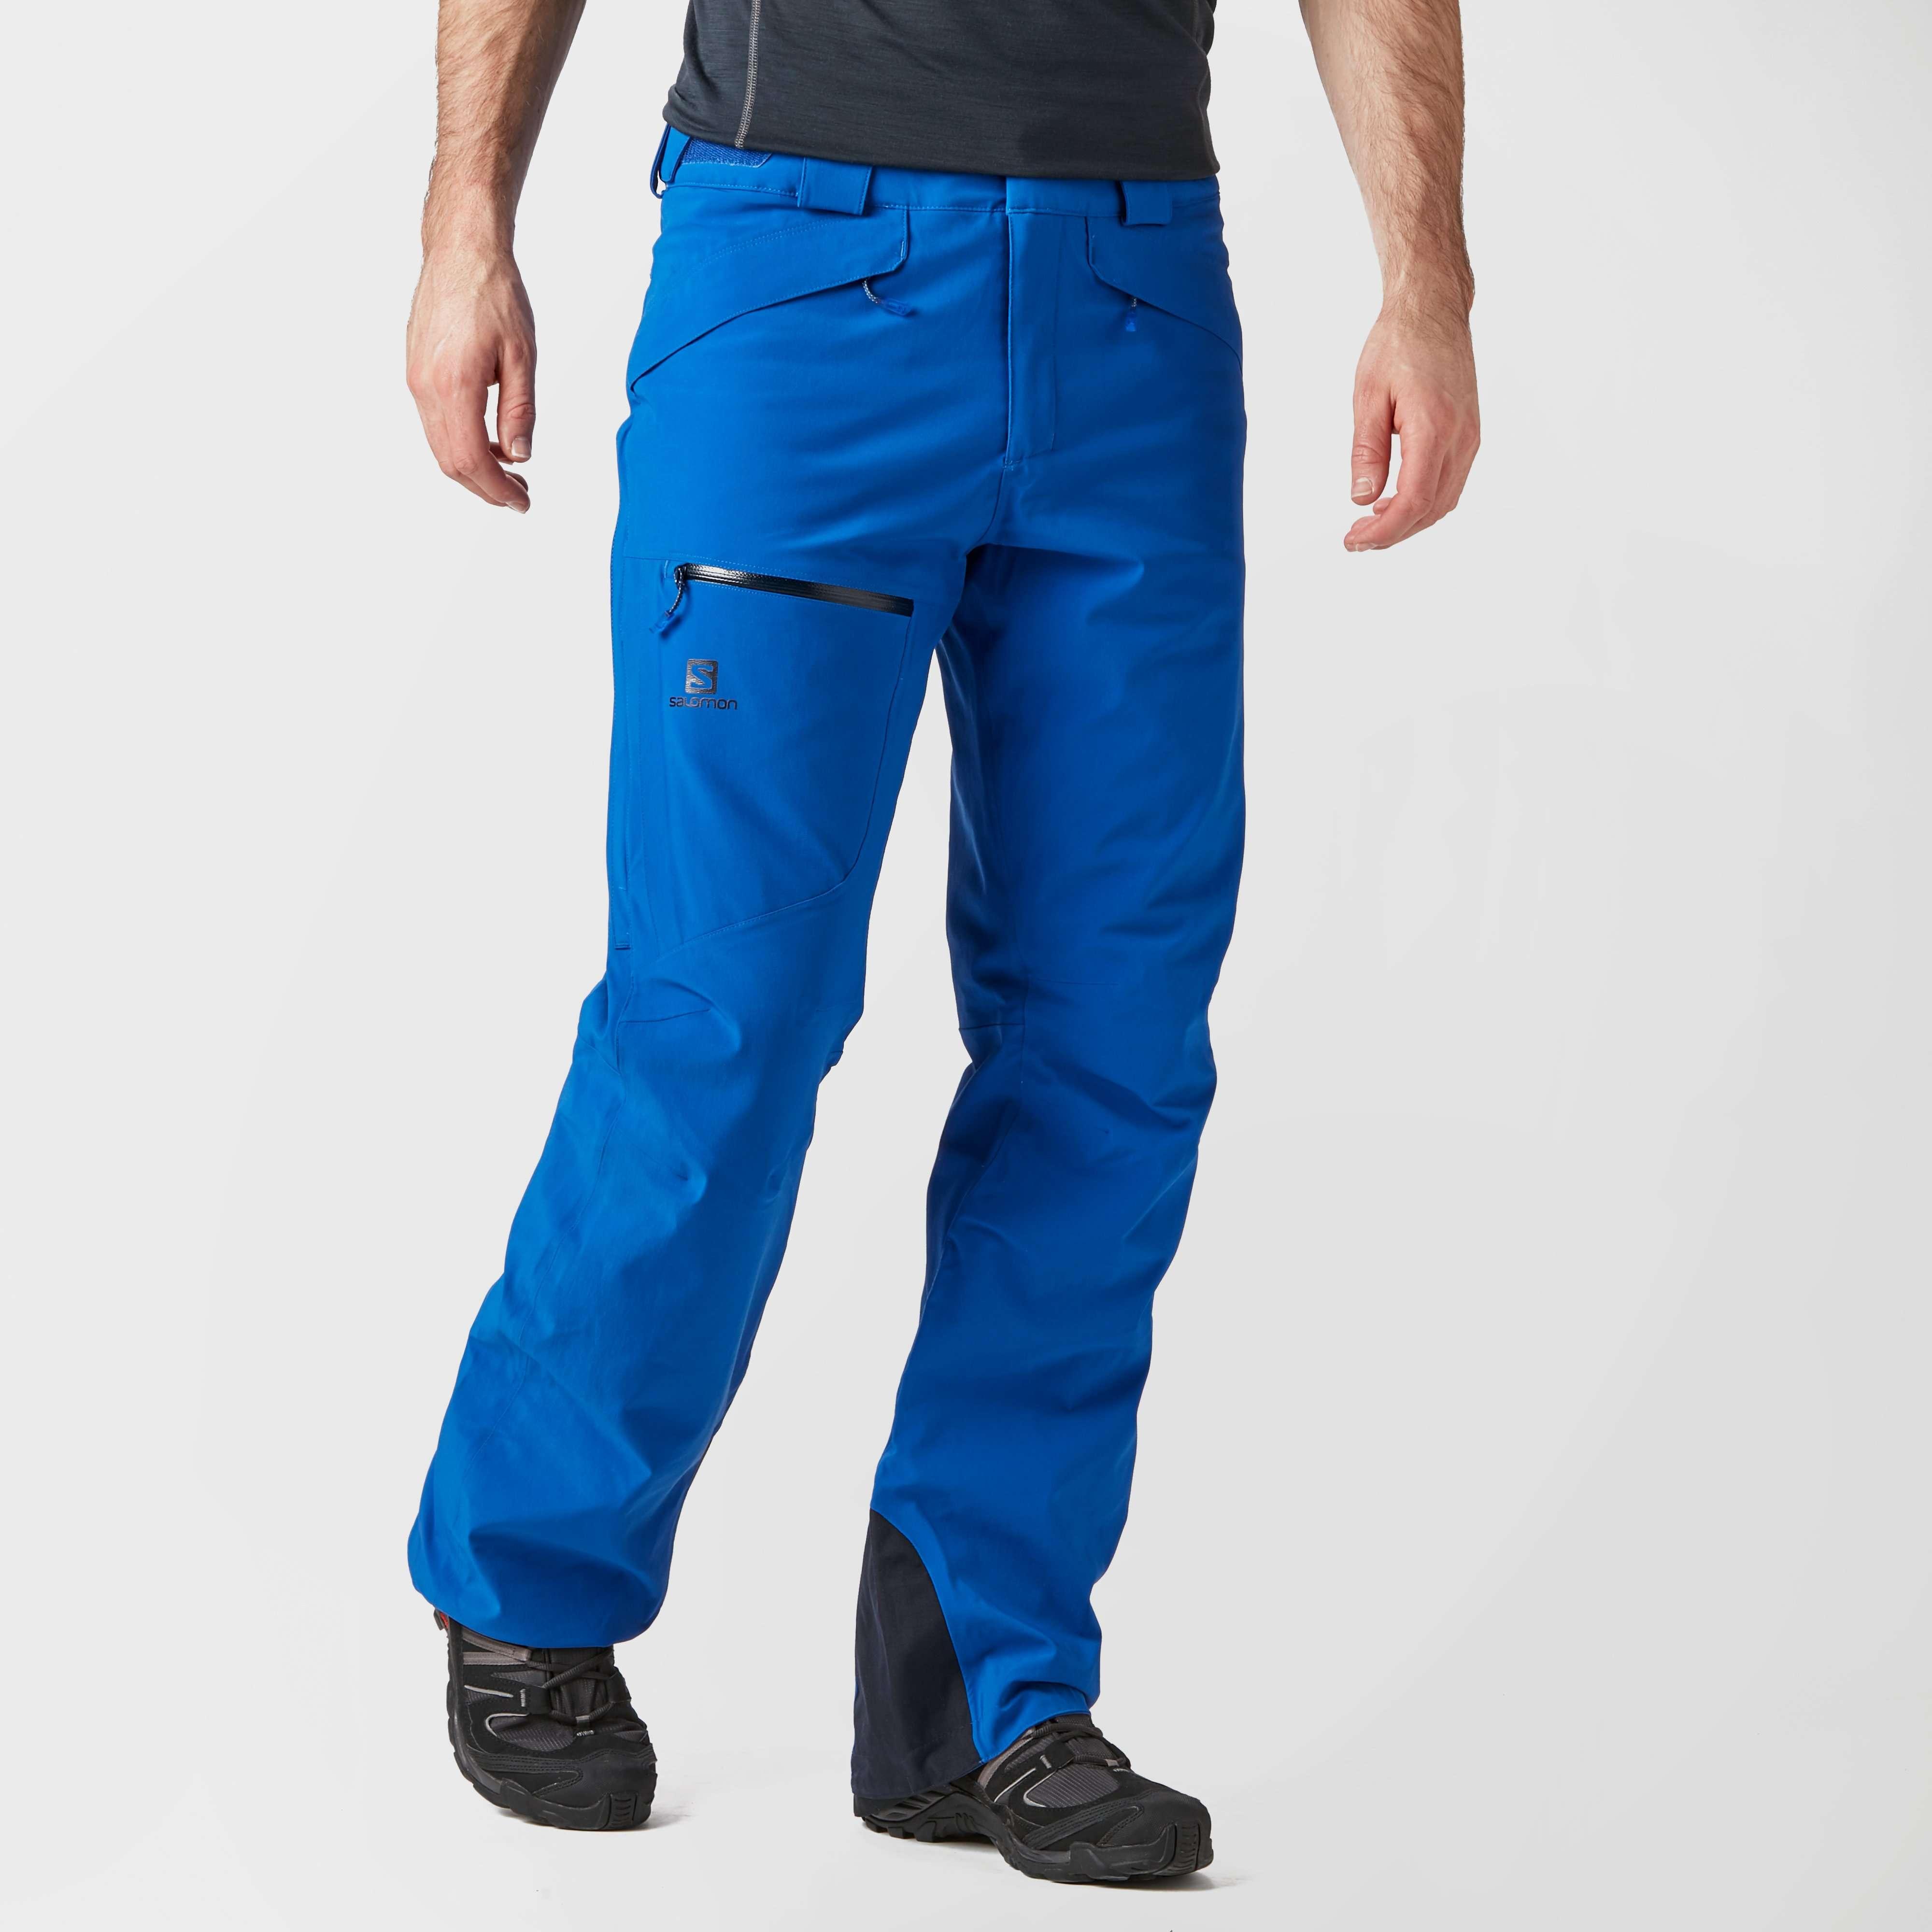 SALOMON Men's Brilliant Ski Pants